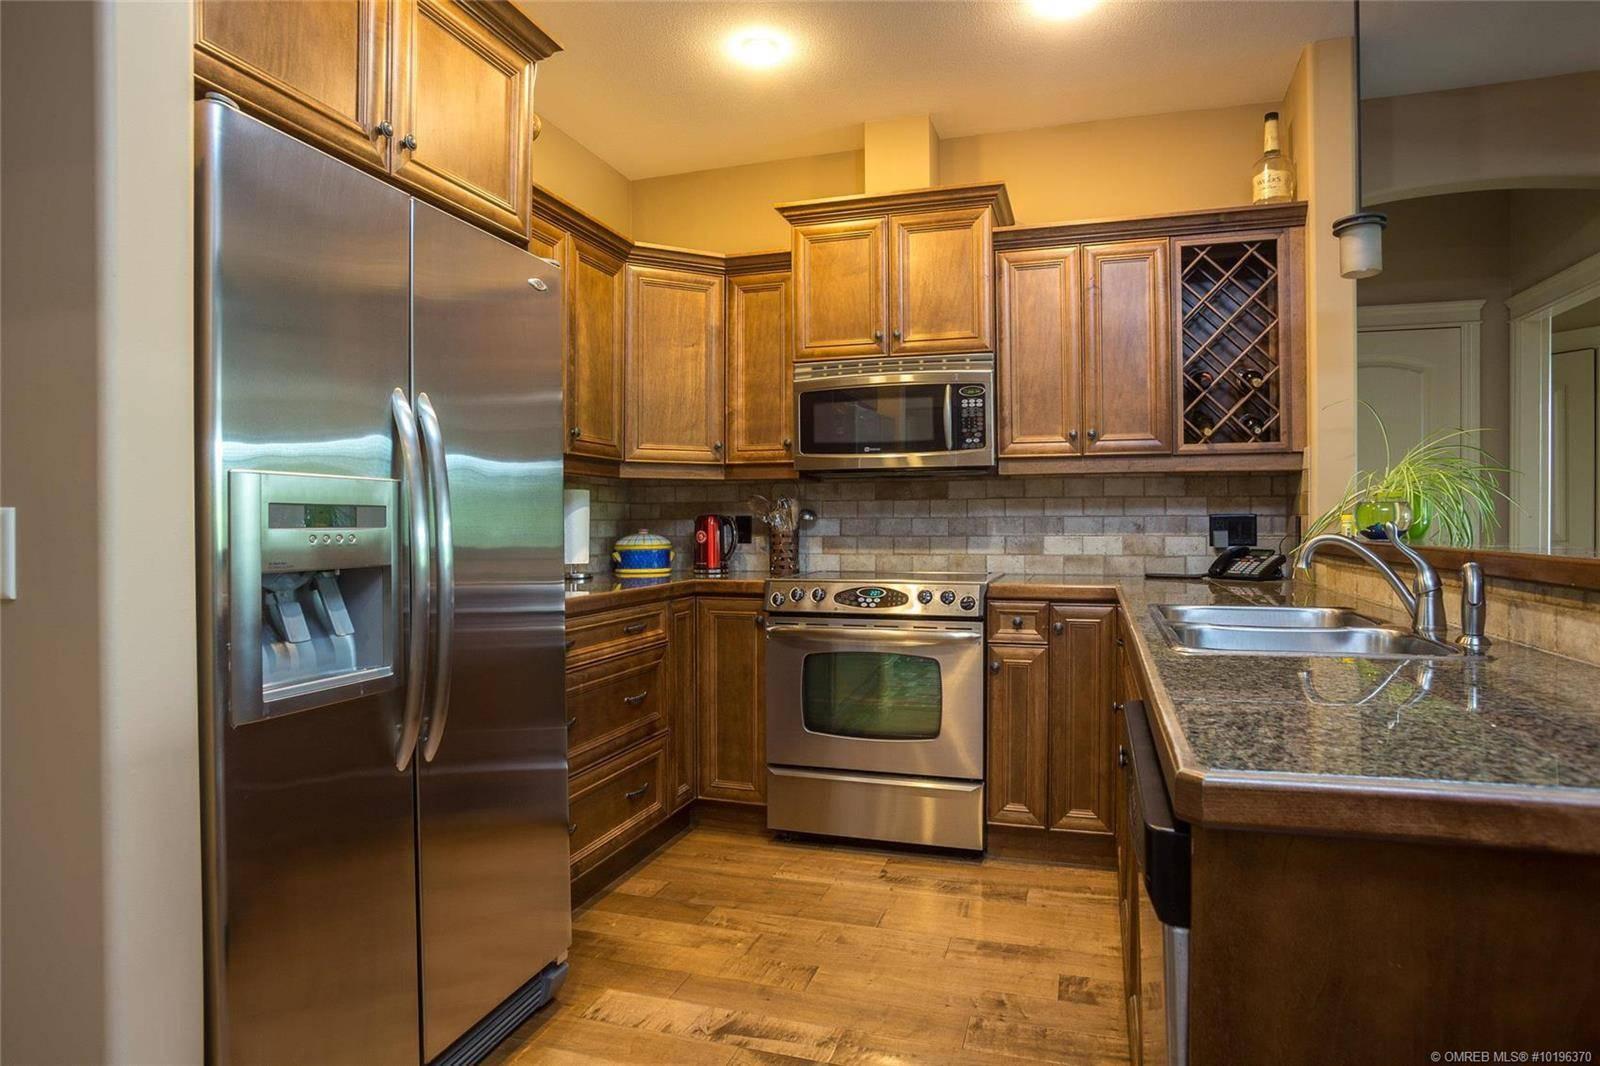 Condo for sale at 2770 Auburn Rd Unit 101 West Kelowna British Columbia - MLS: 10196370